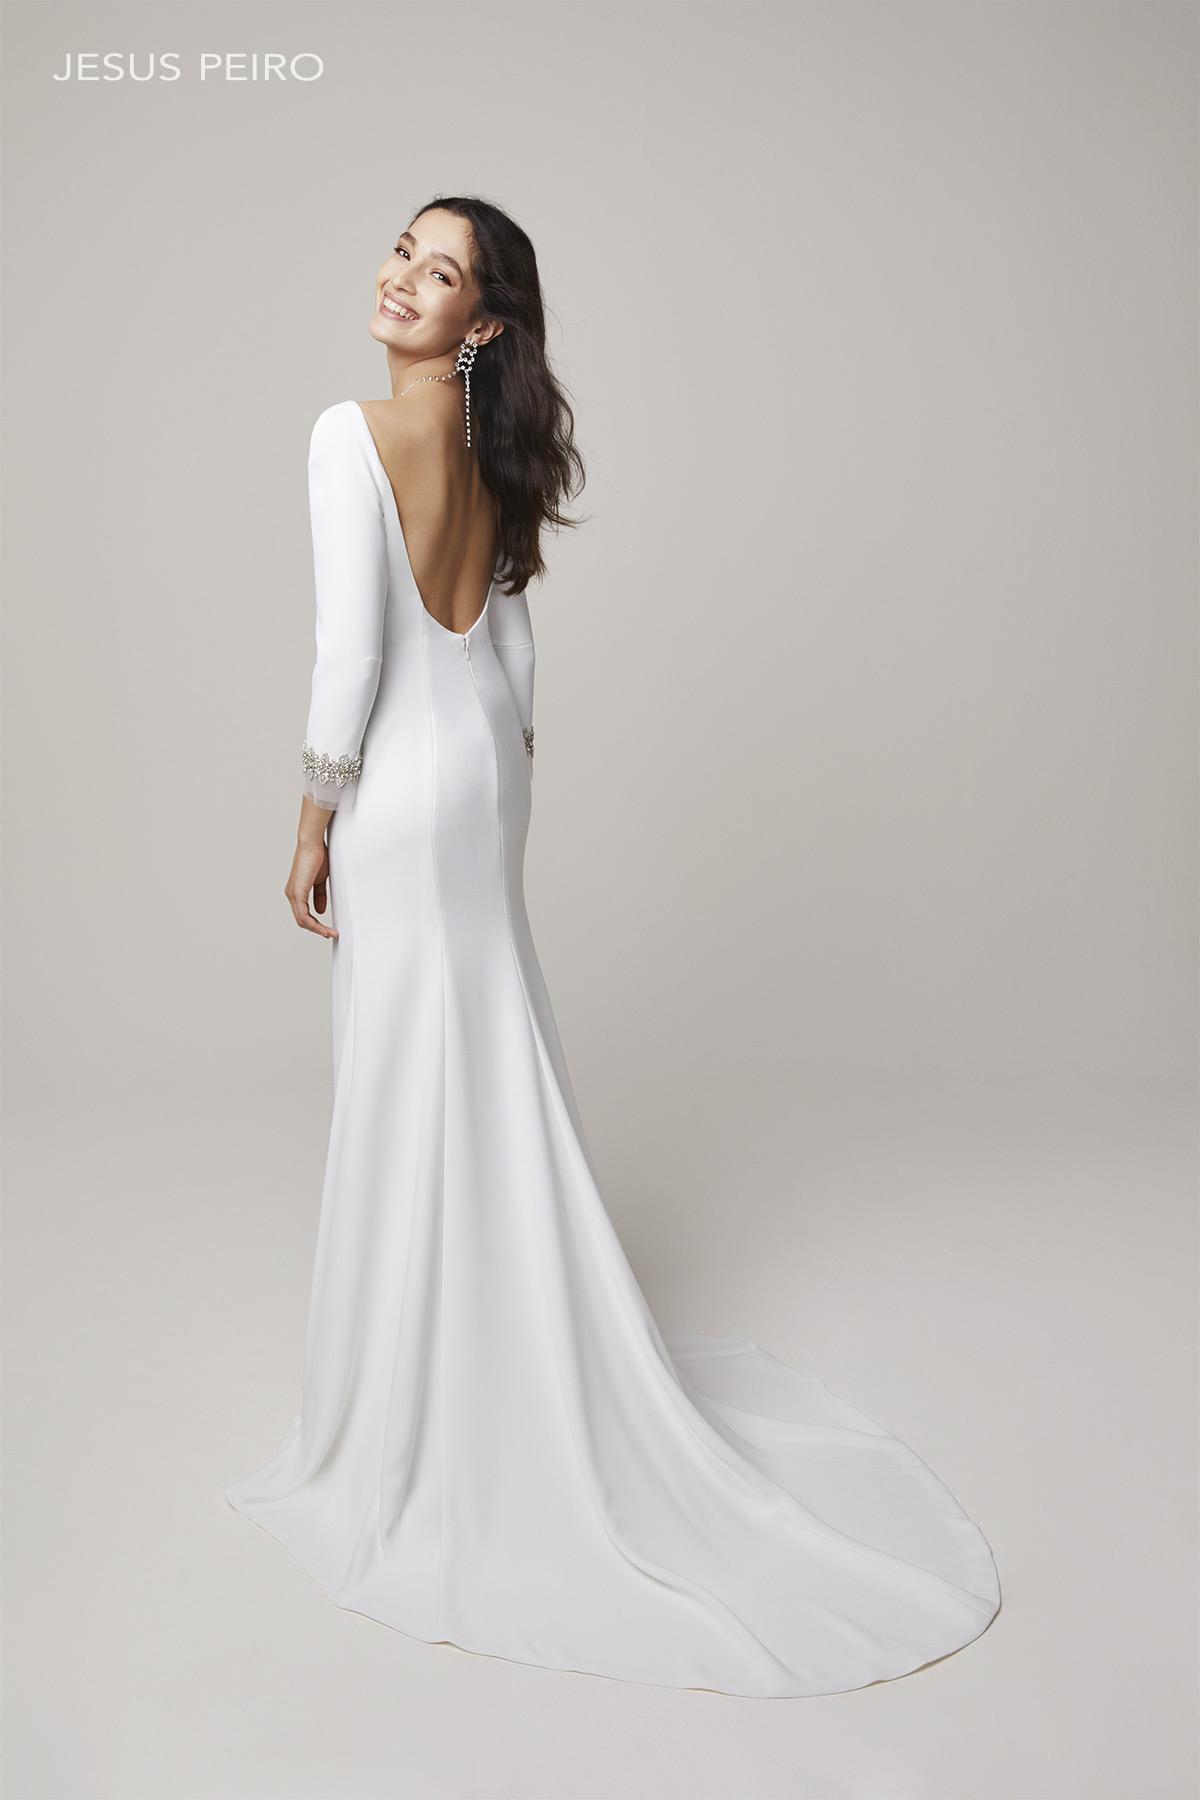 Vestido novia Jesús Peiró Ref.2208